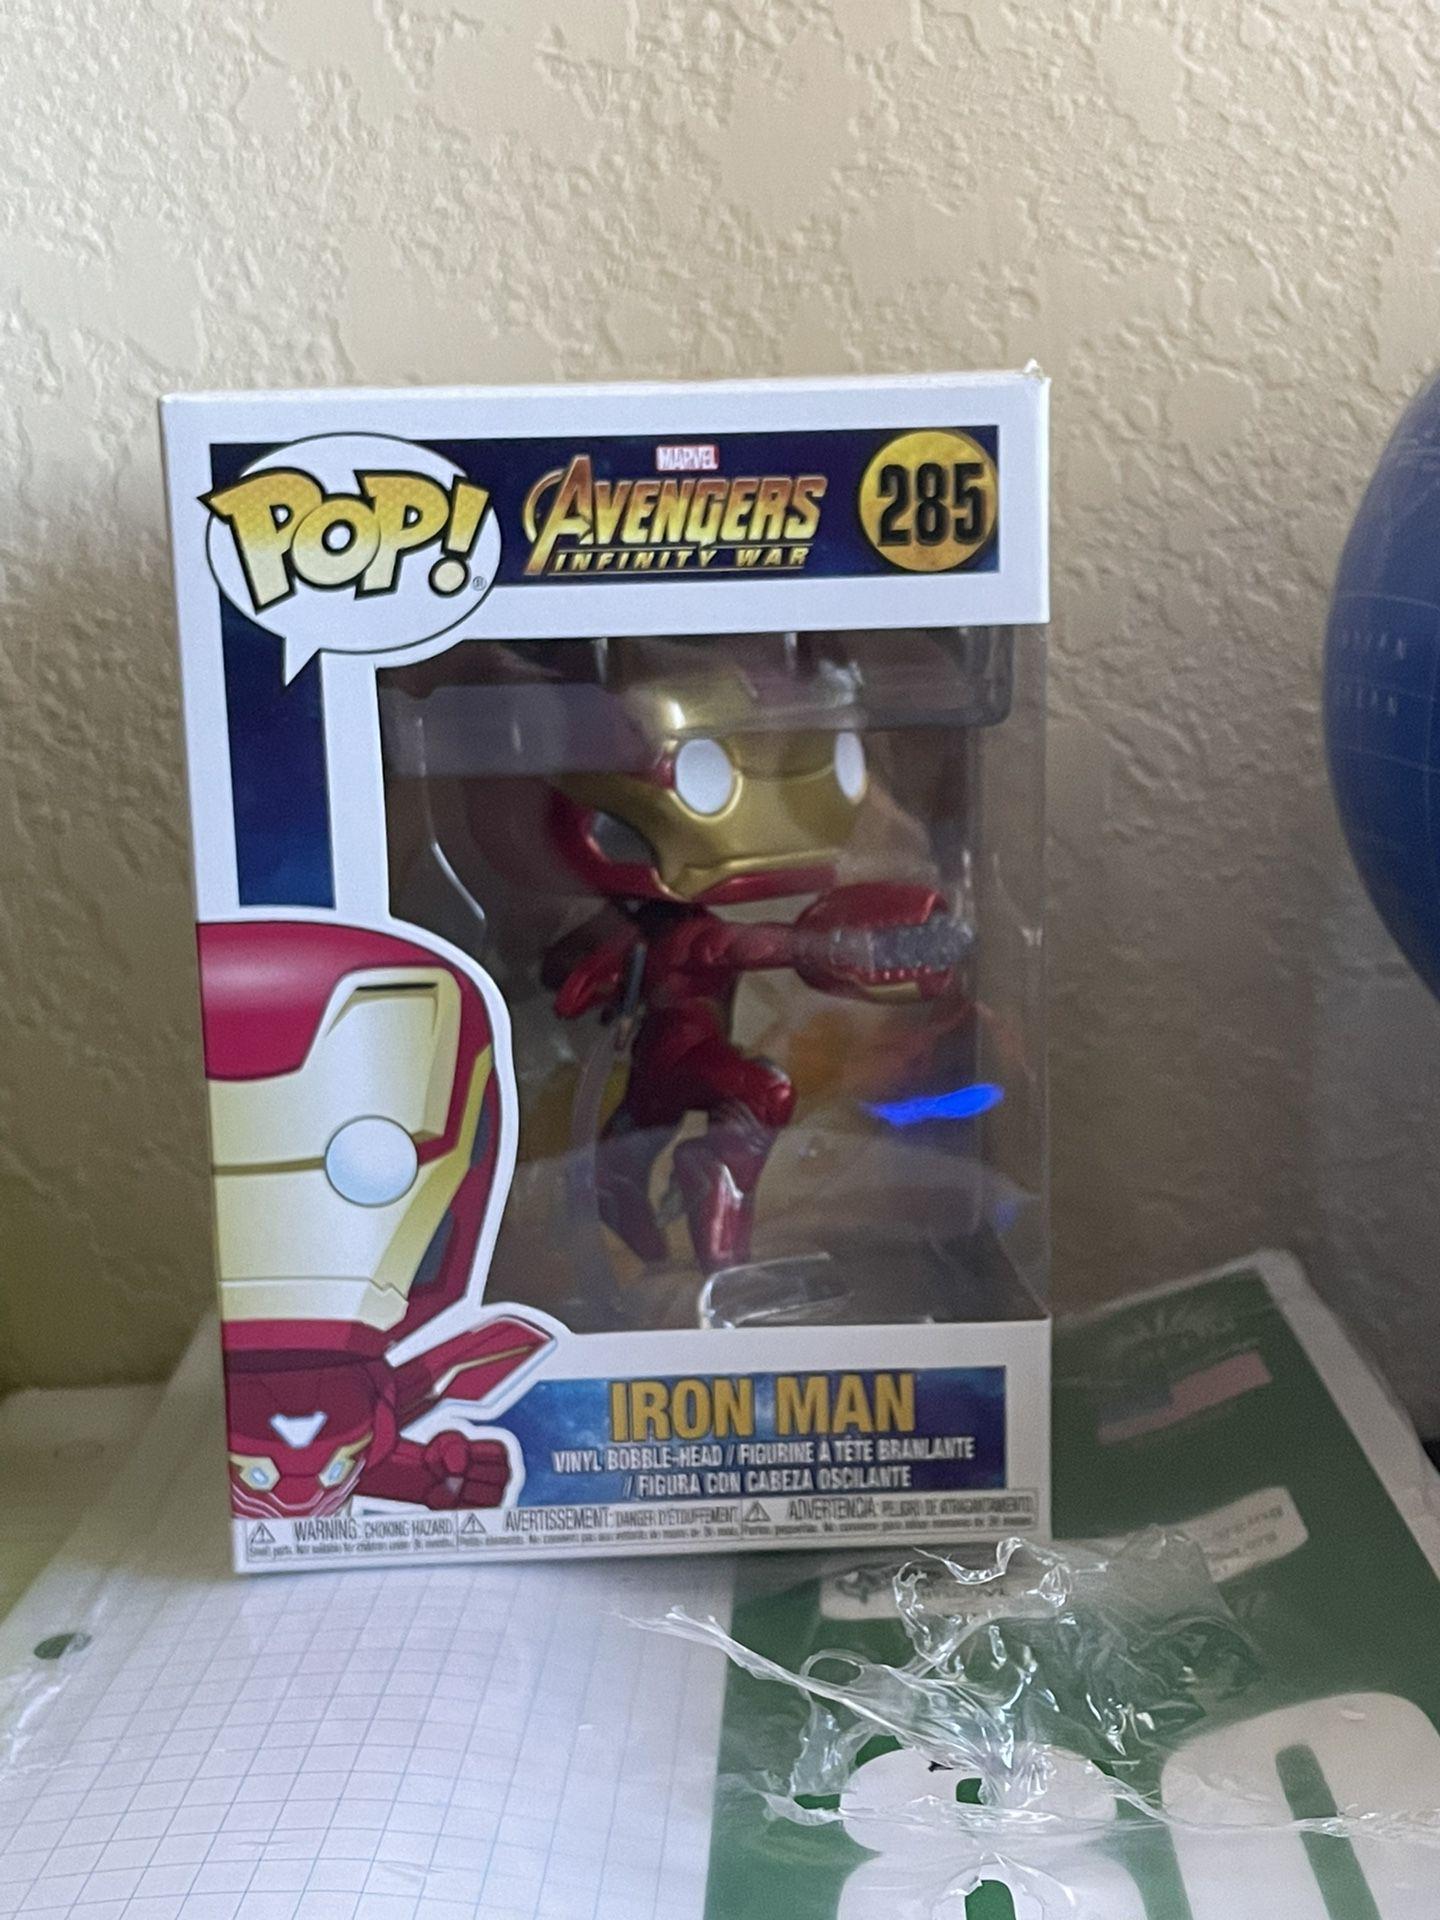 Avengers Infinity War Iron Man Funko Pop #285